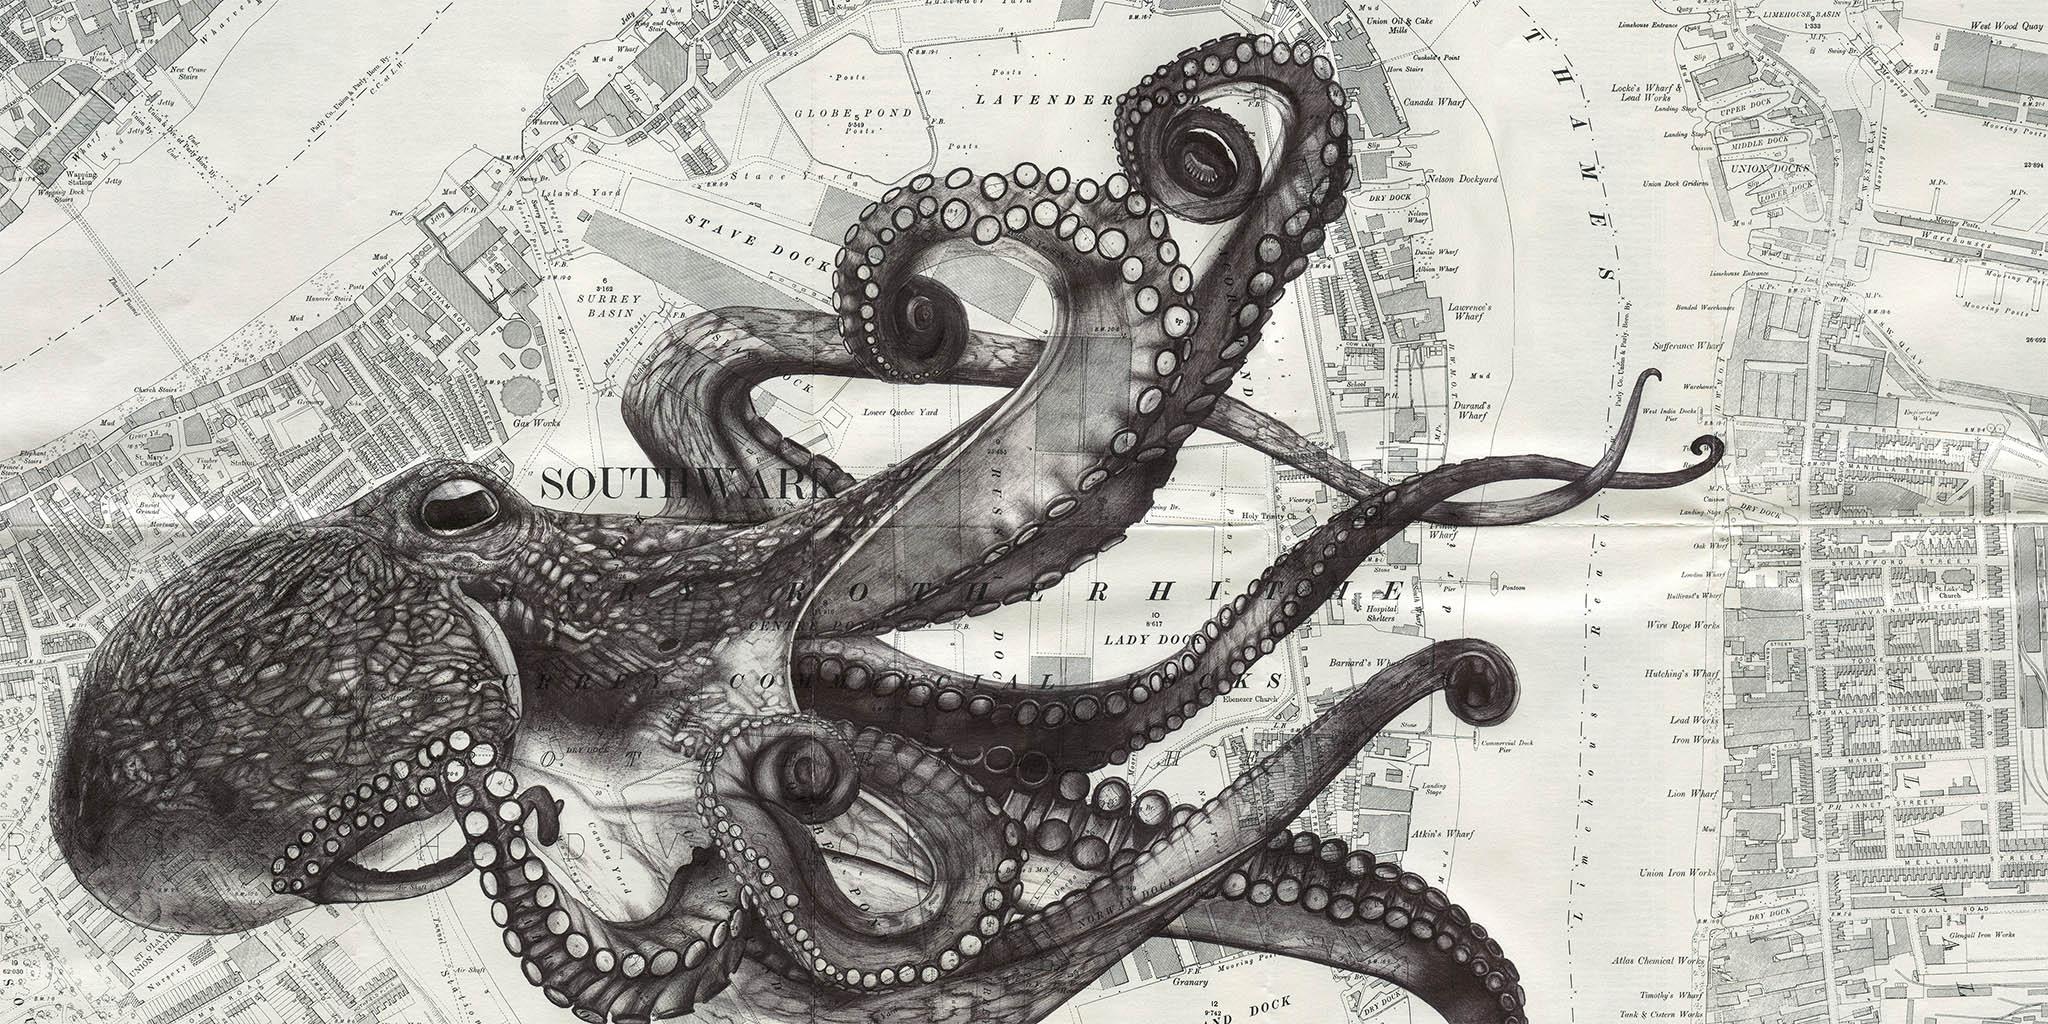 Southwark Octopus